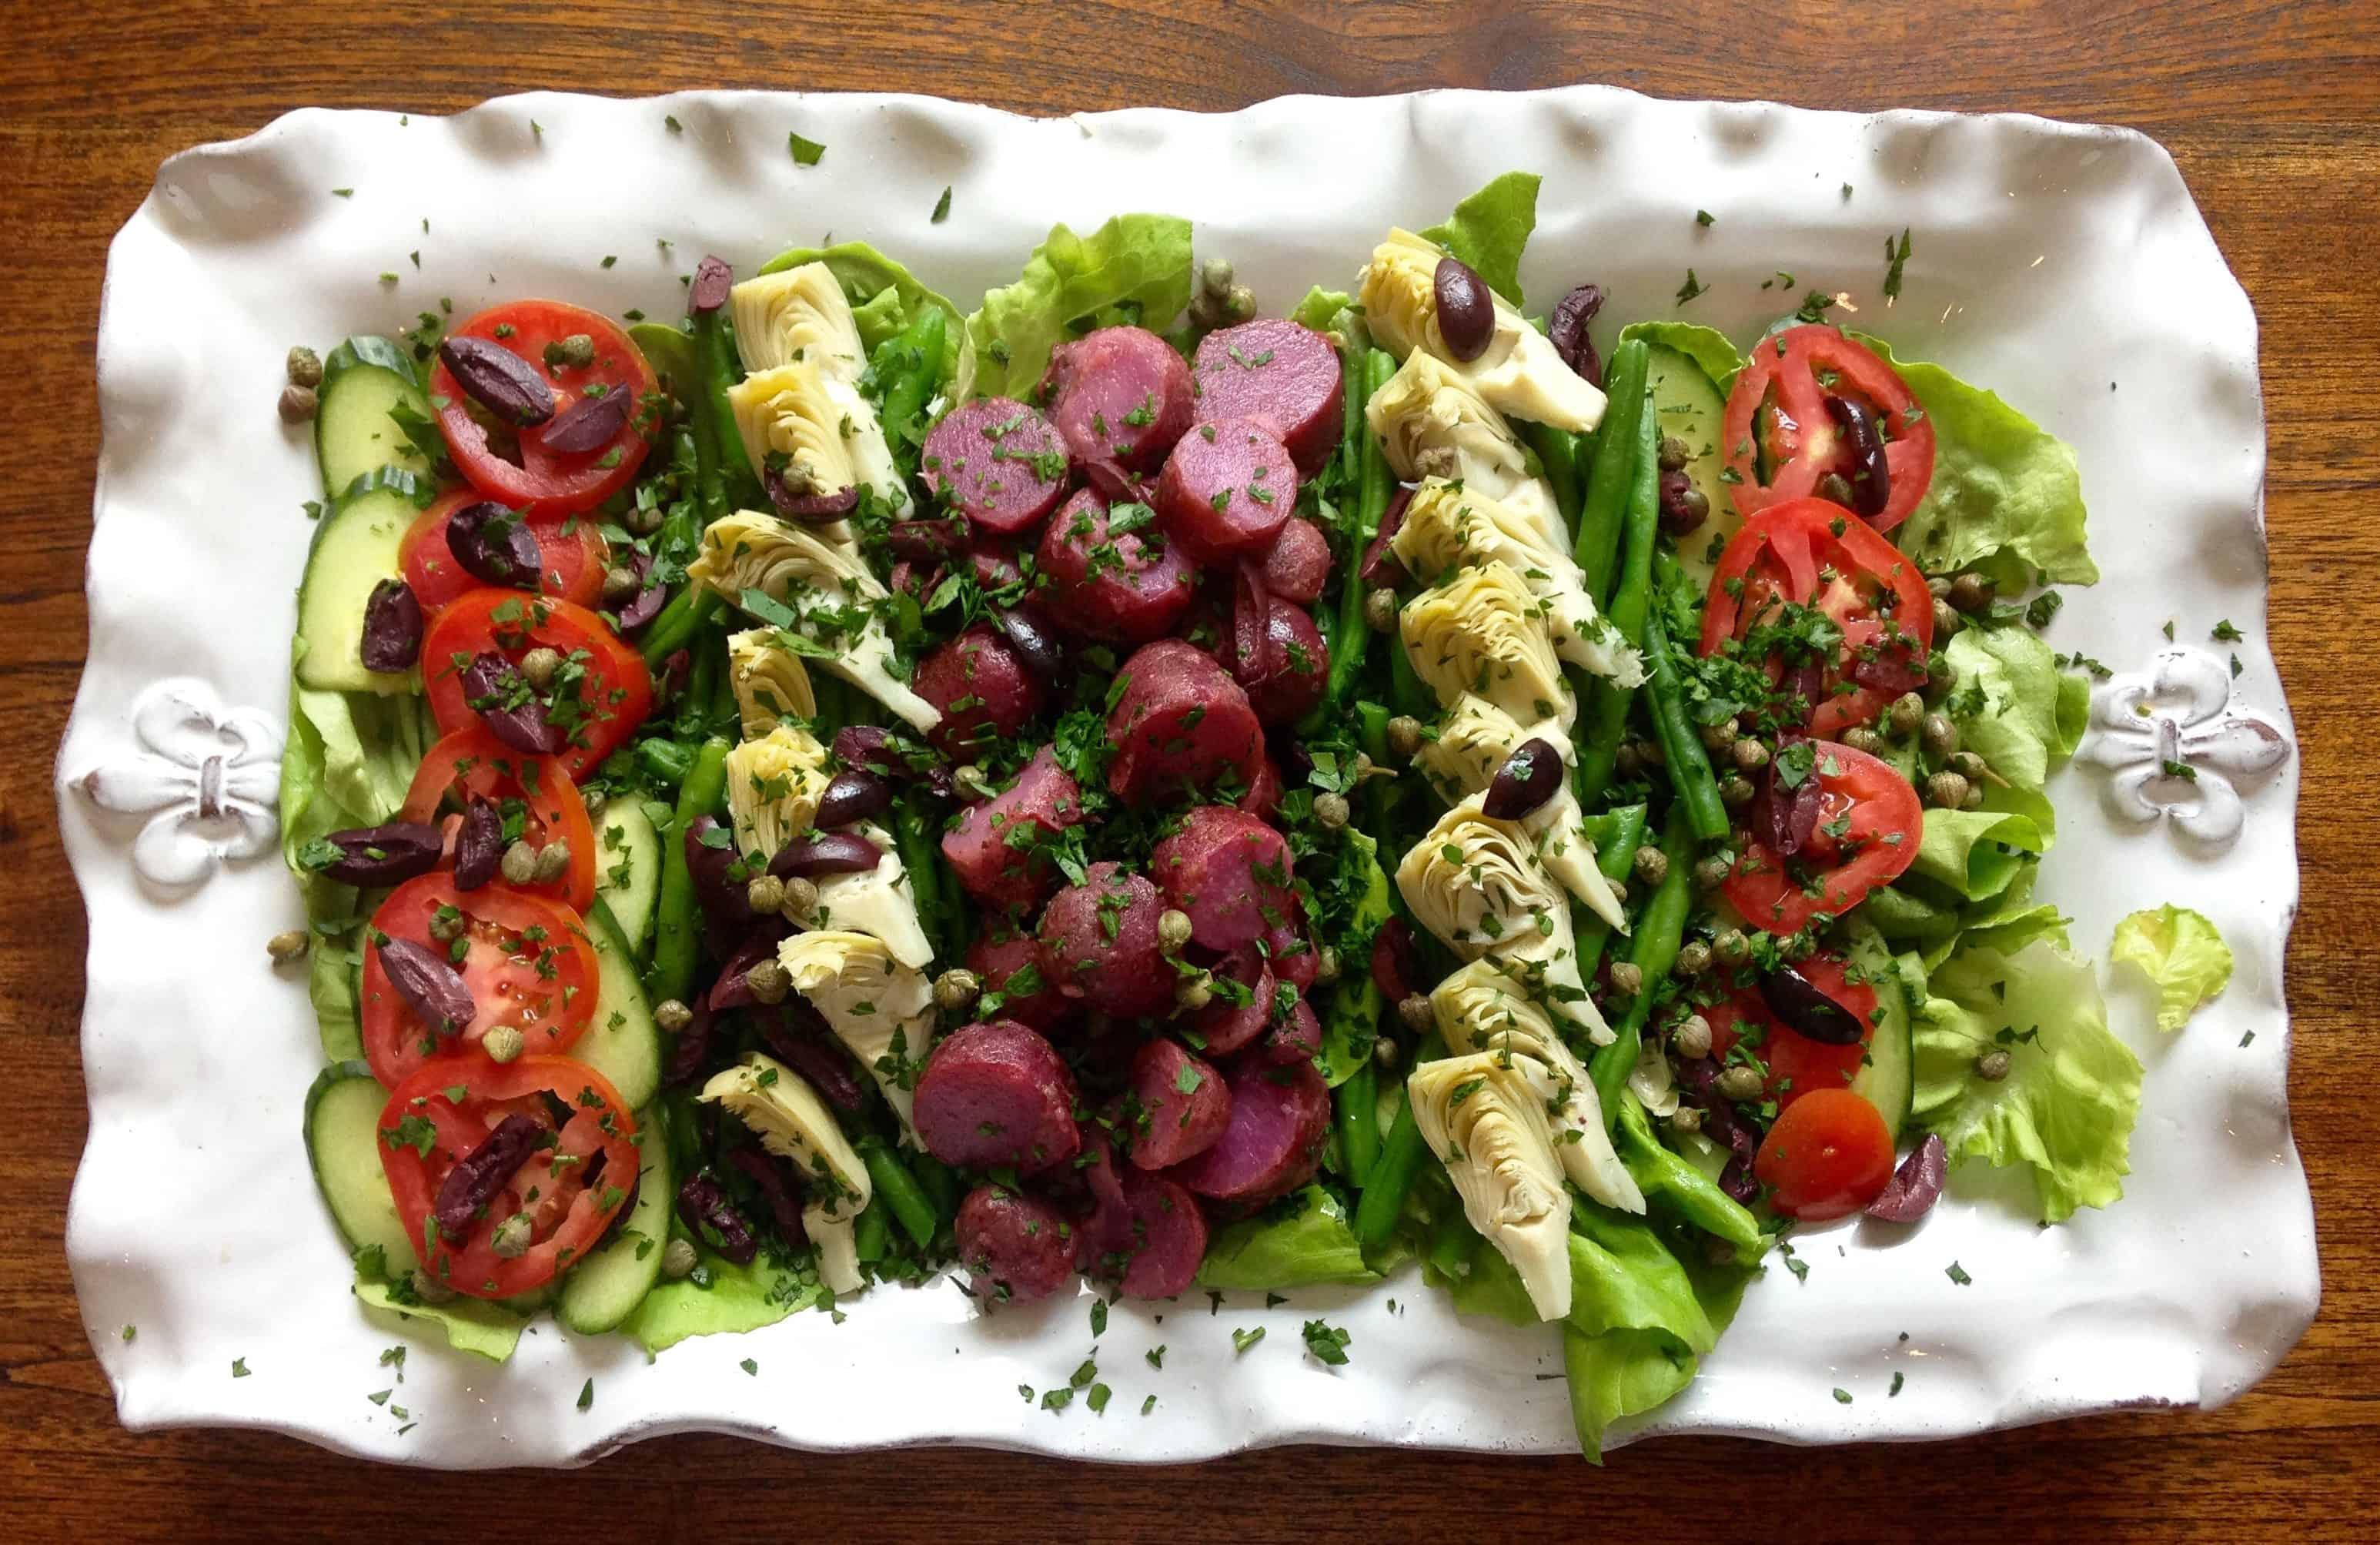 photo of nicoise salad